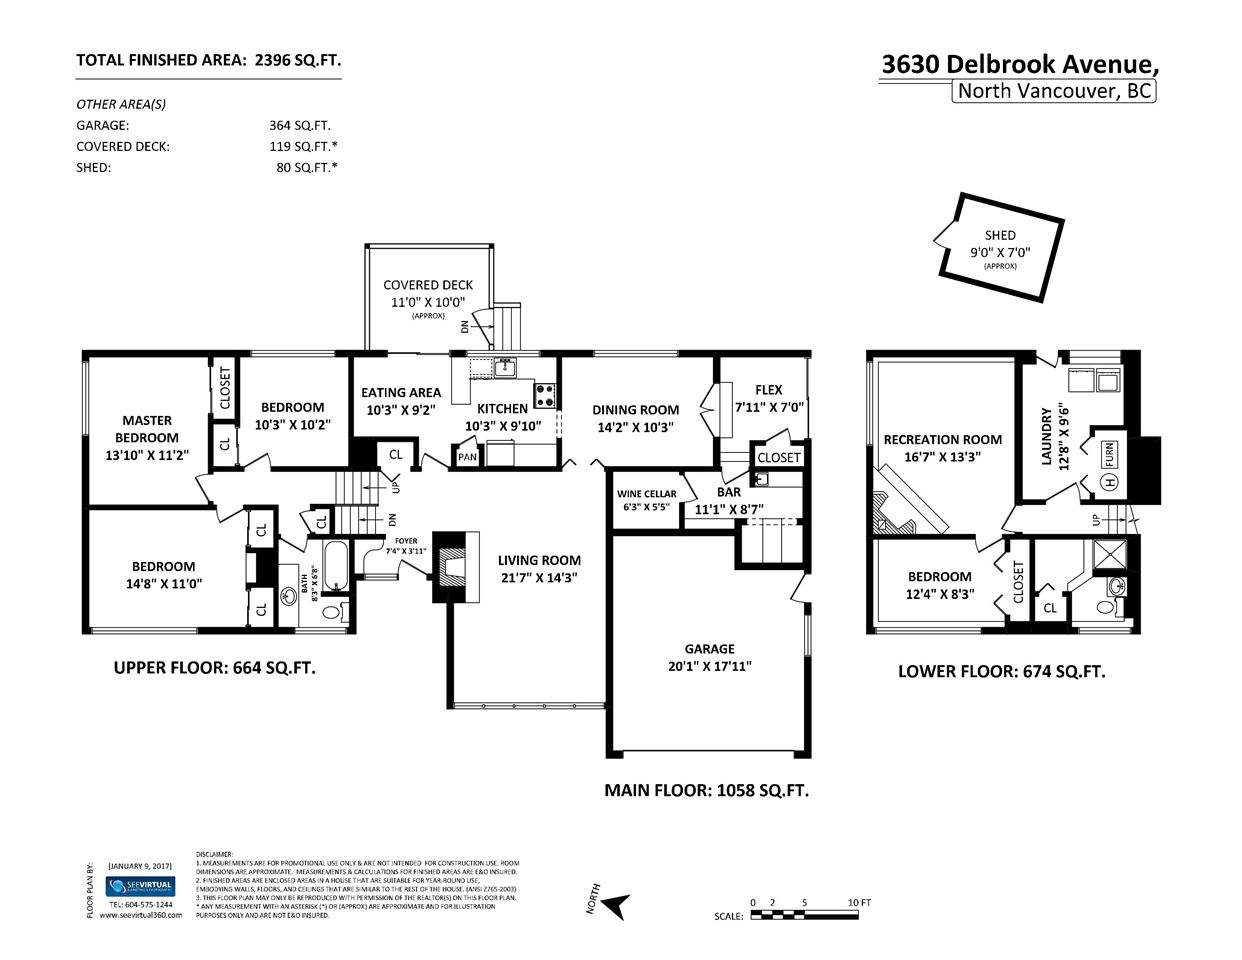 Phil LeGree Real Estate Group : Keller Williams Realty